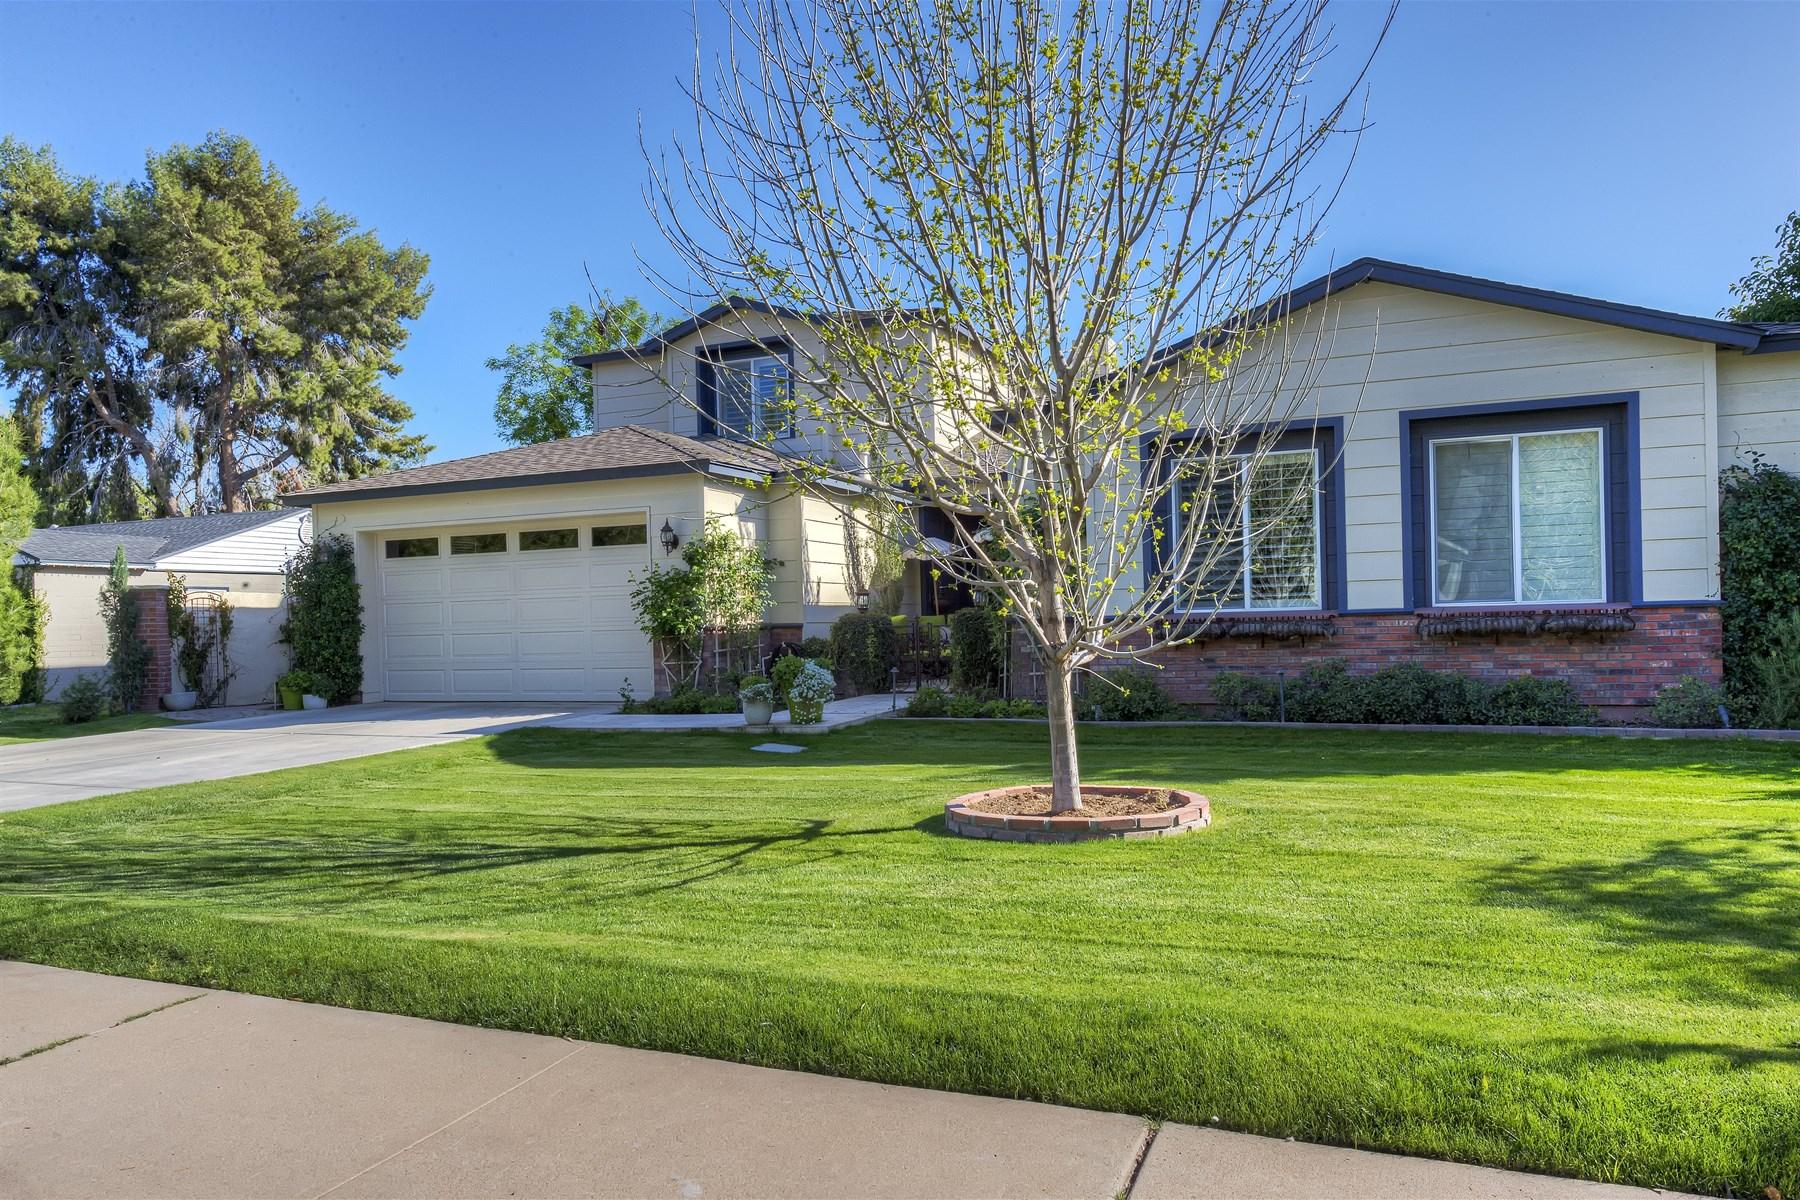 Moradia para Venda às Fabulous Central Phoenix Home 327 W San Juan Ave Phoenix, Arizona 85013 Estados Unidos